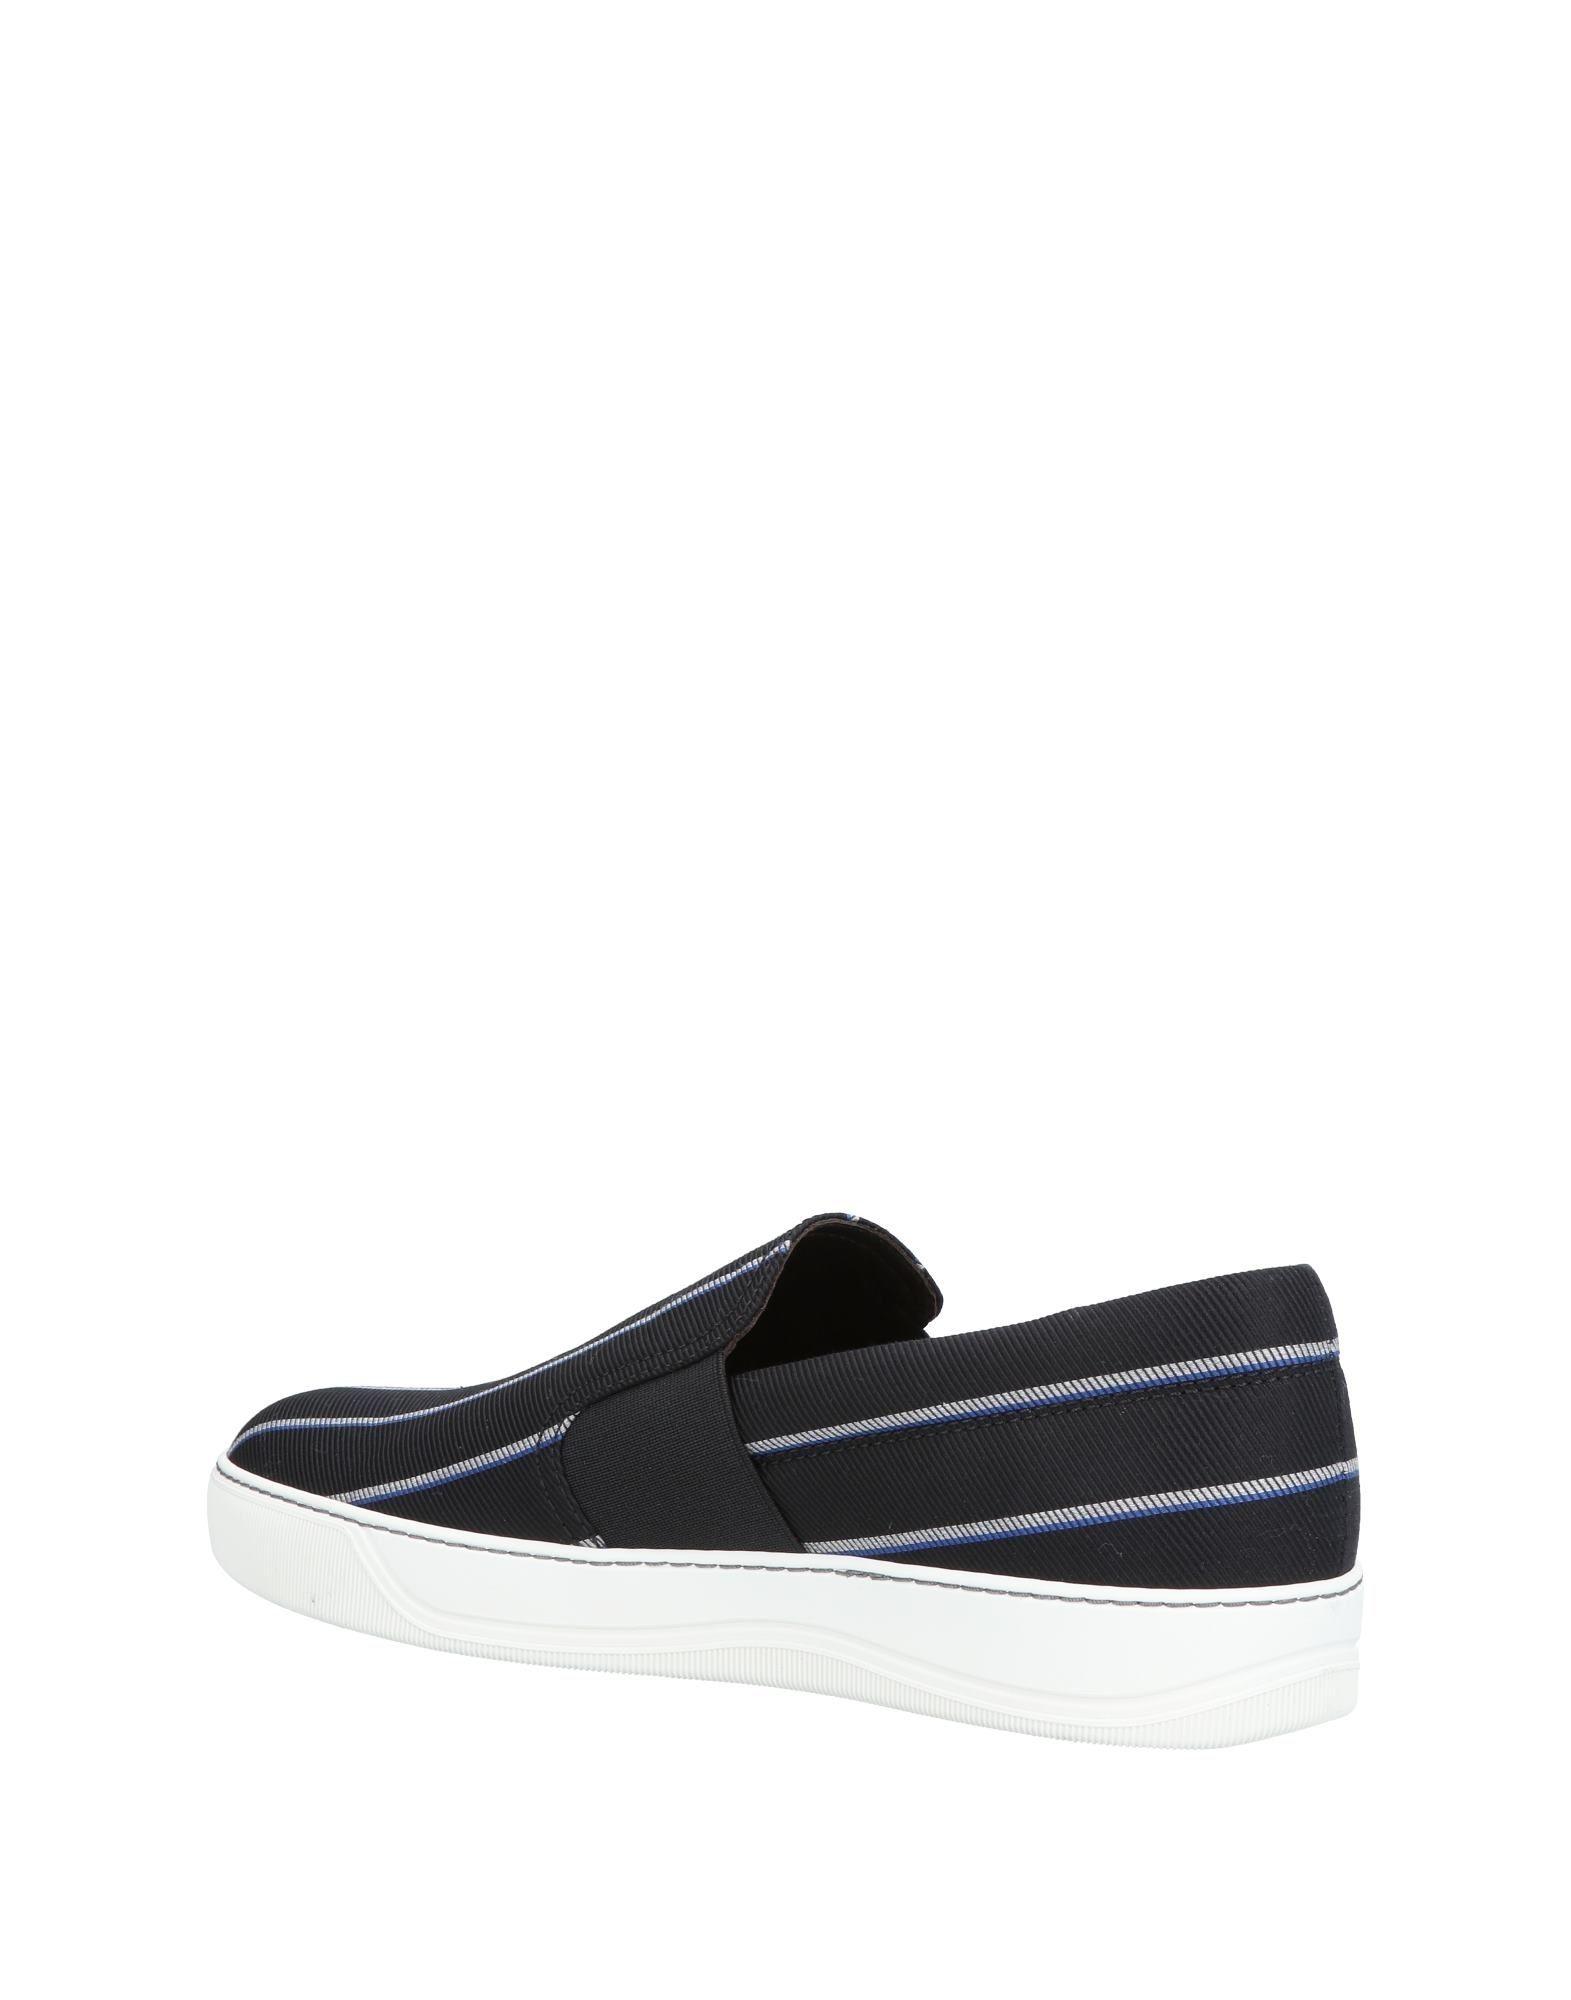 Lanvin Sneakers Herren  11439530KM Gute Qualität beliebte Schuhe